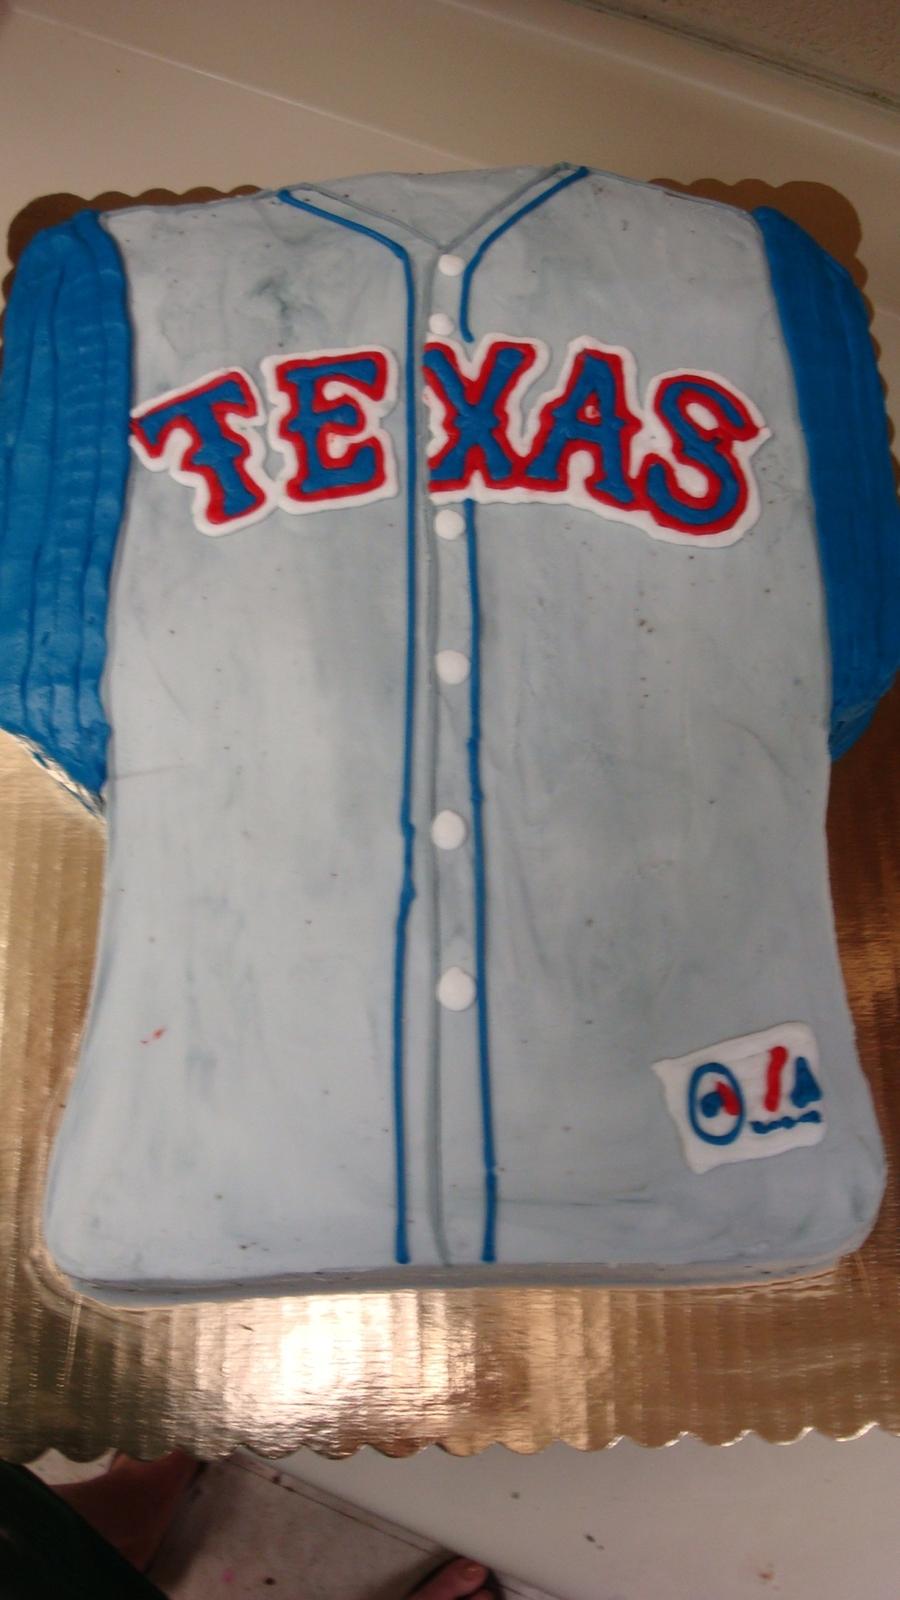 Texas Ranger Jersey Cake